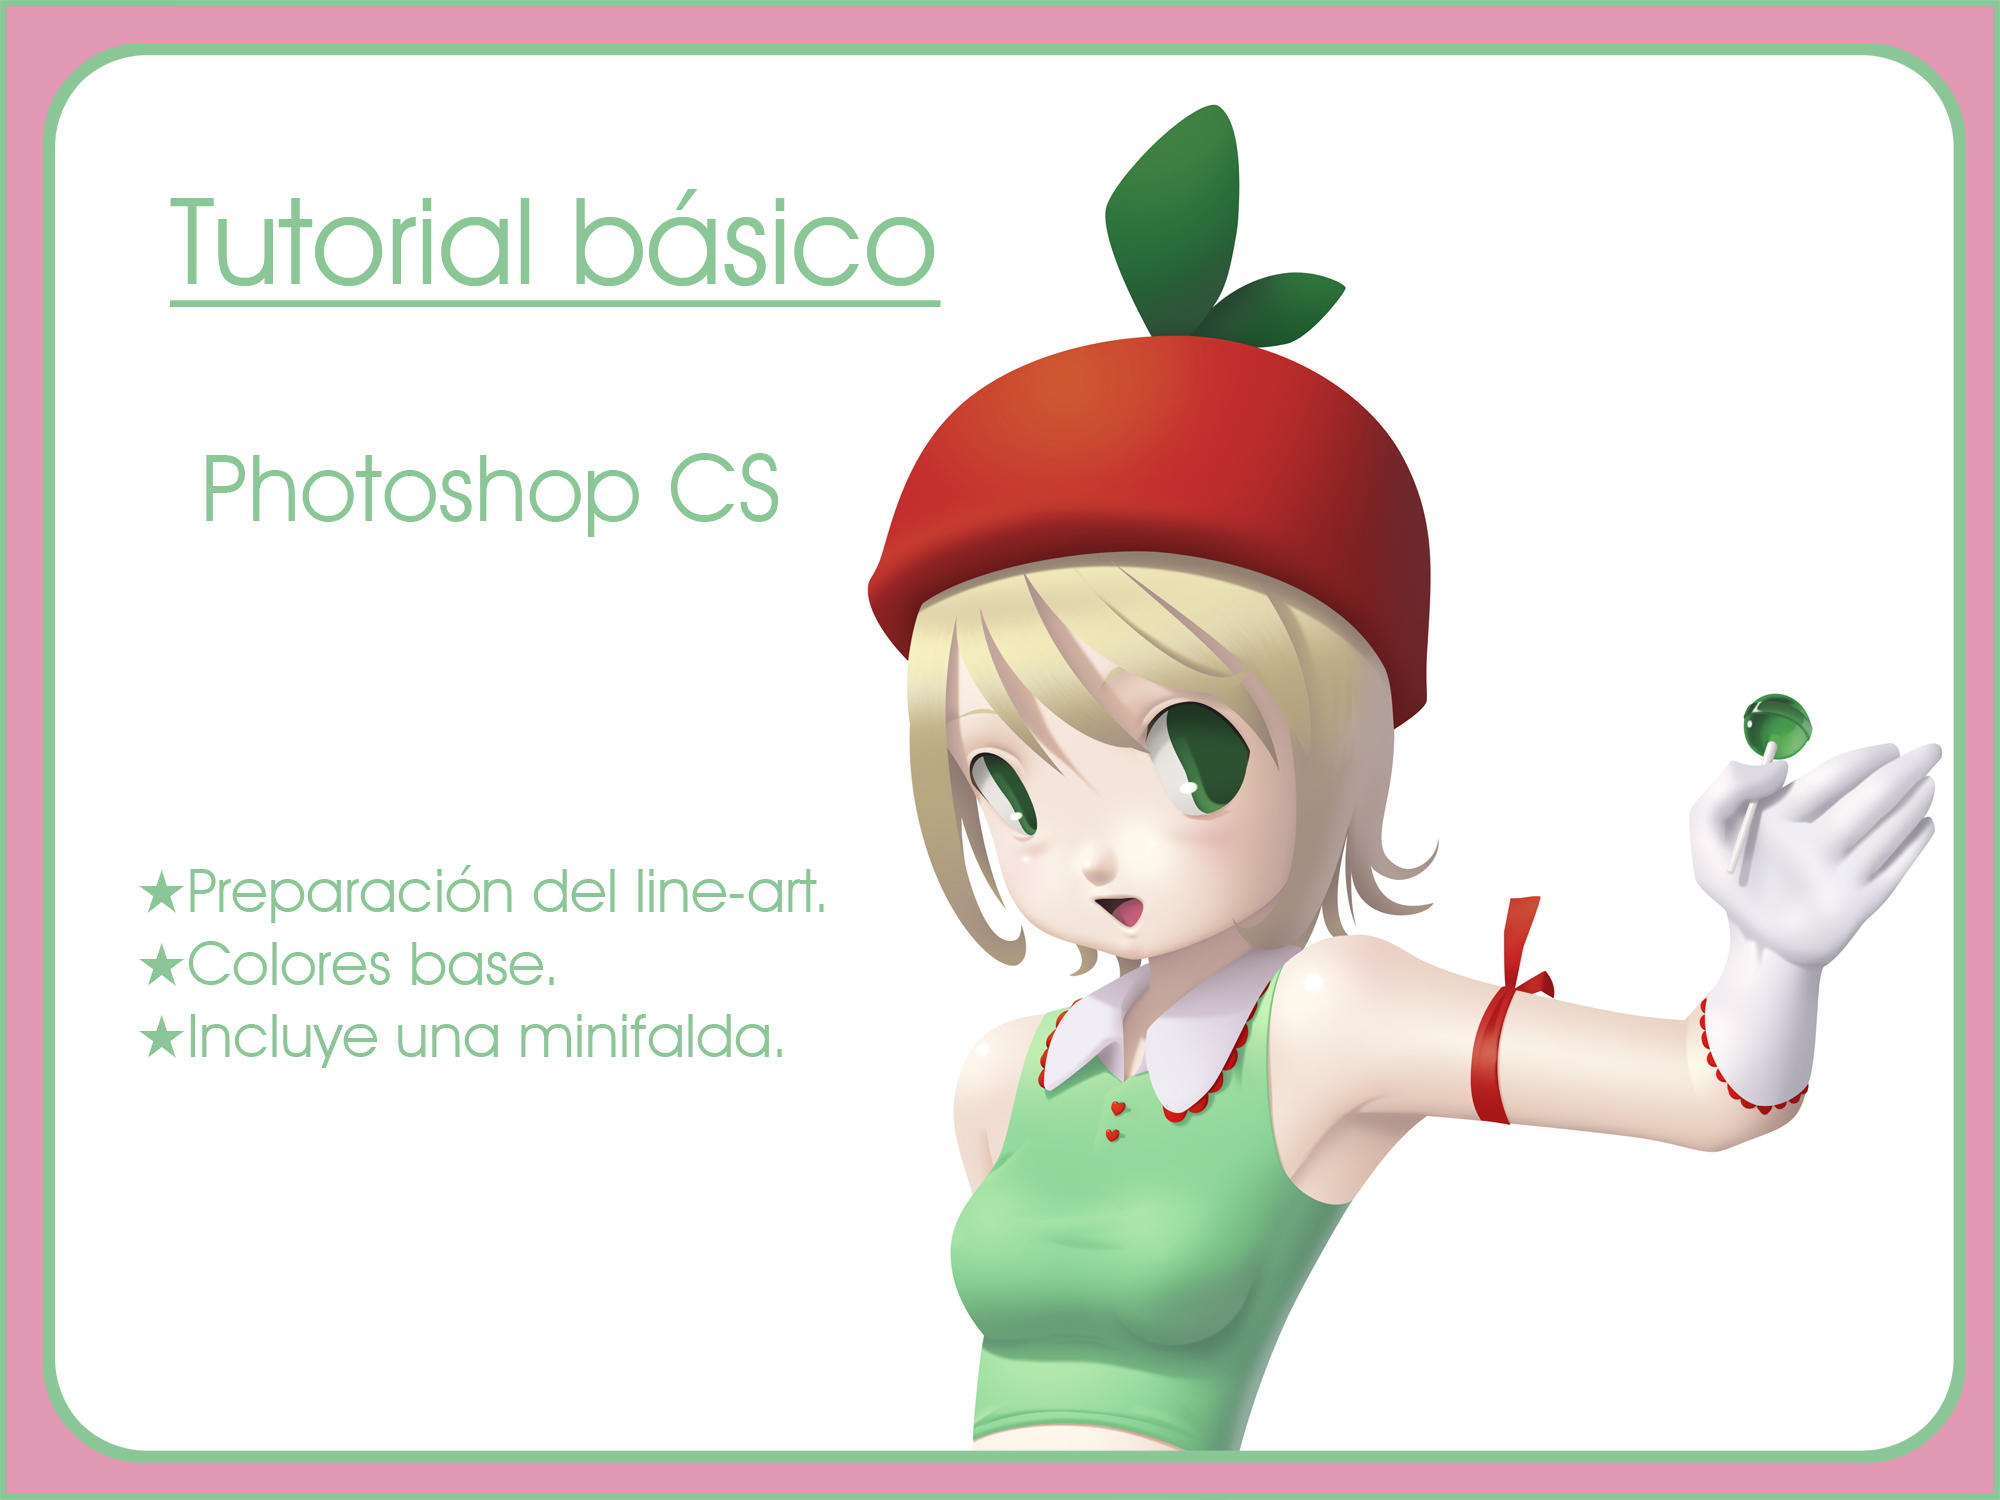 Tutorial basico photoshop CS by ALKEMANUBIS